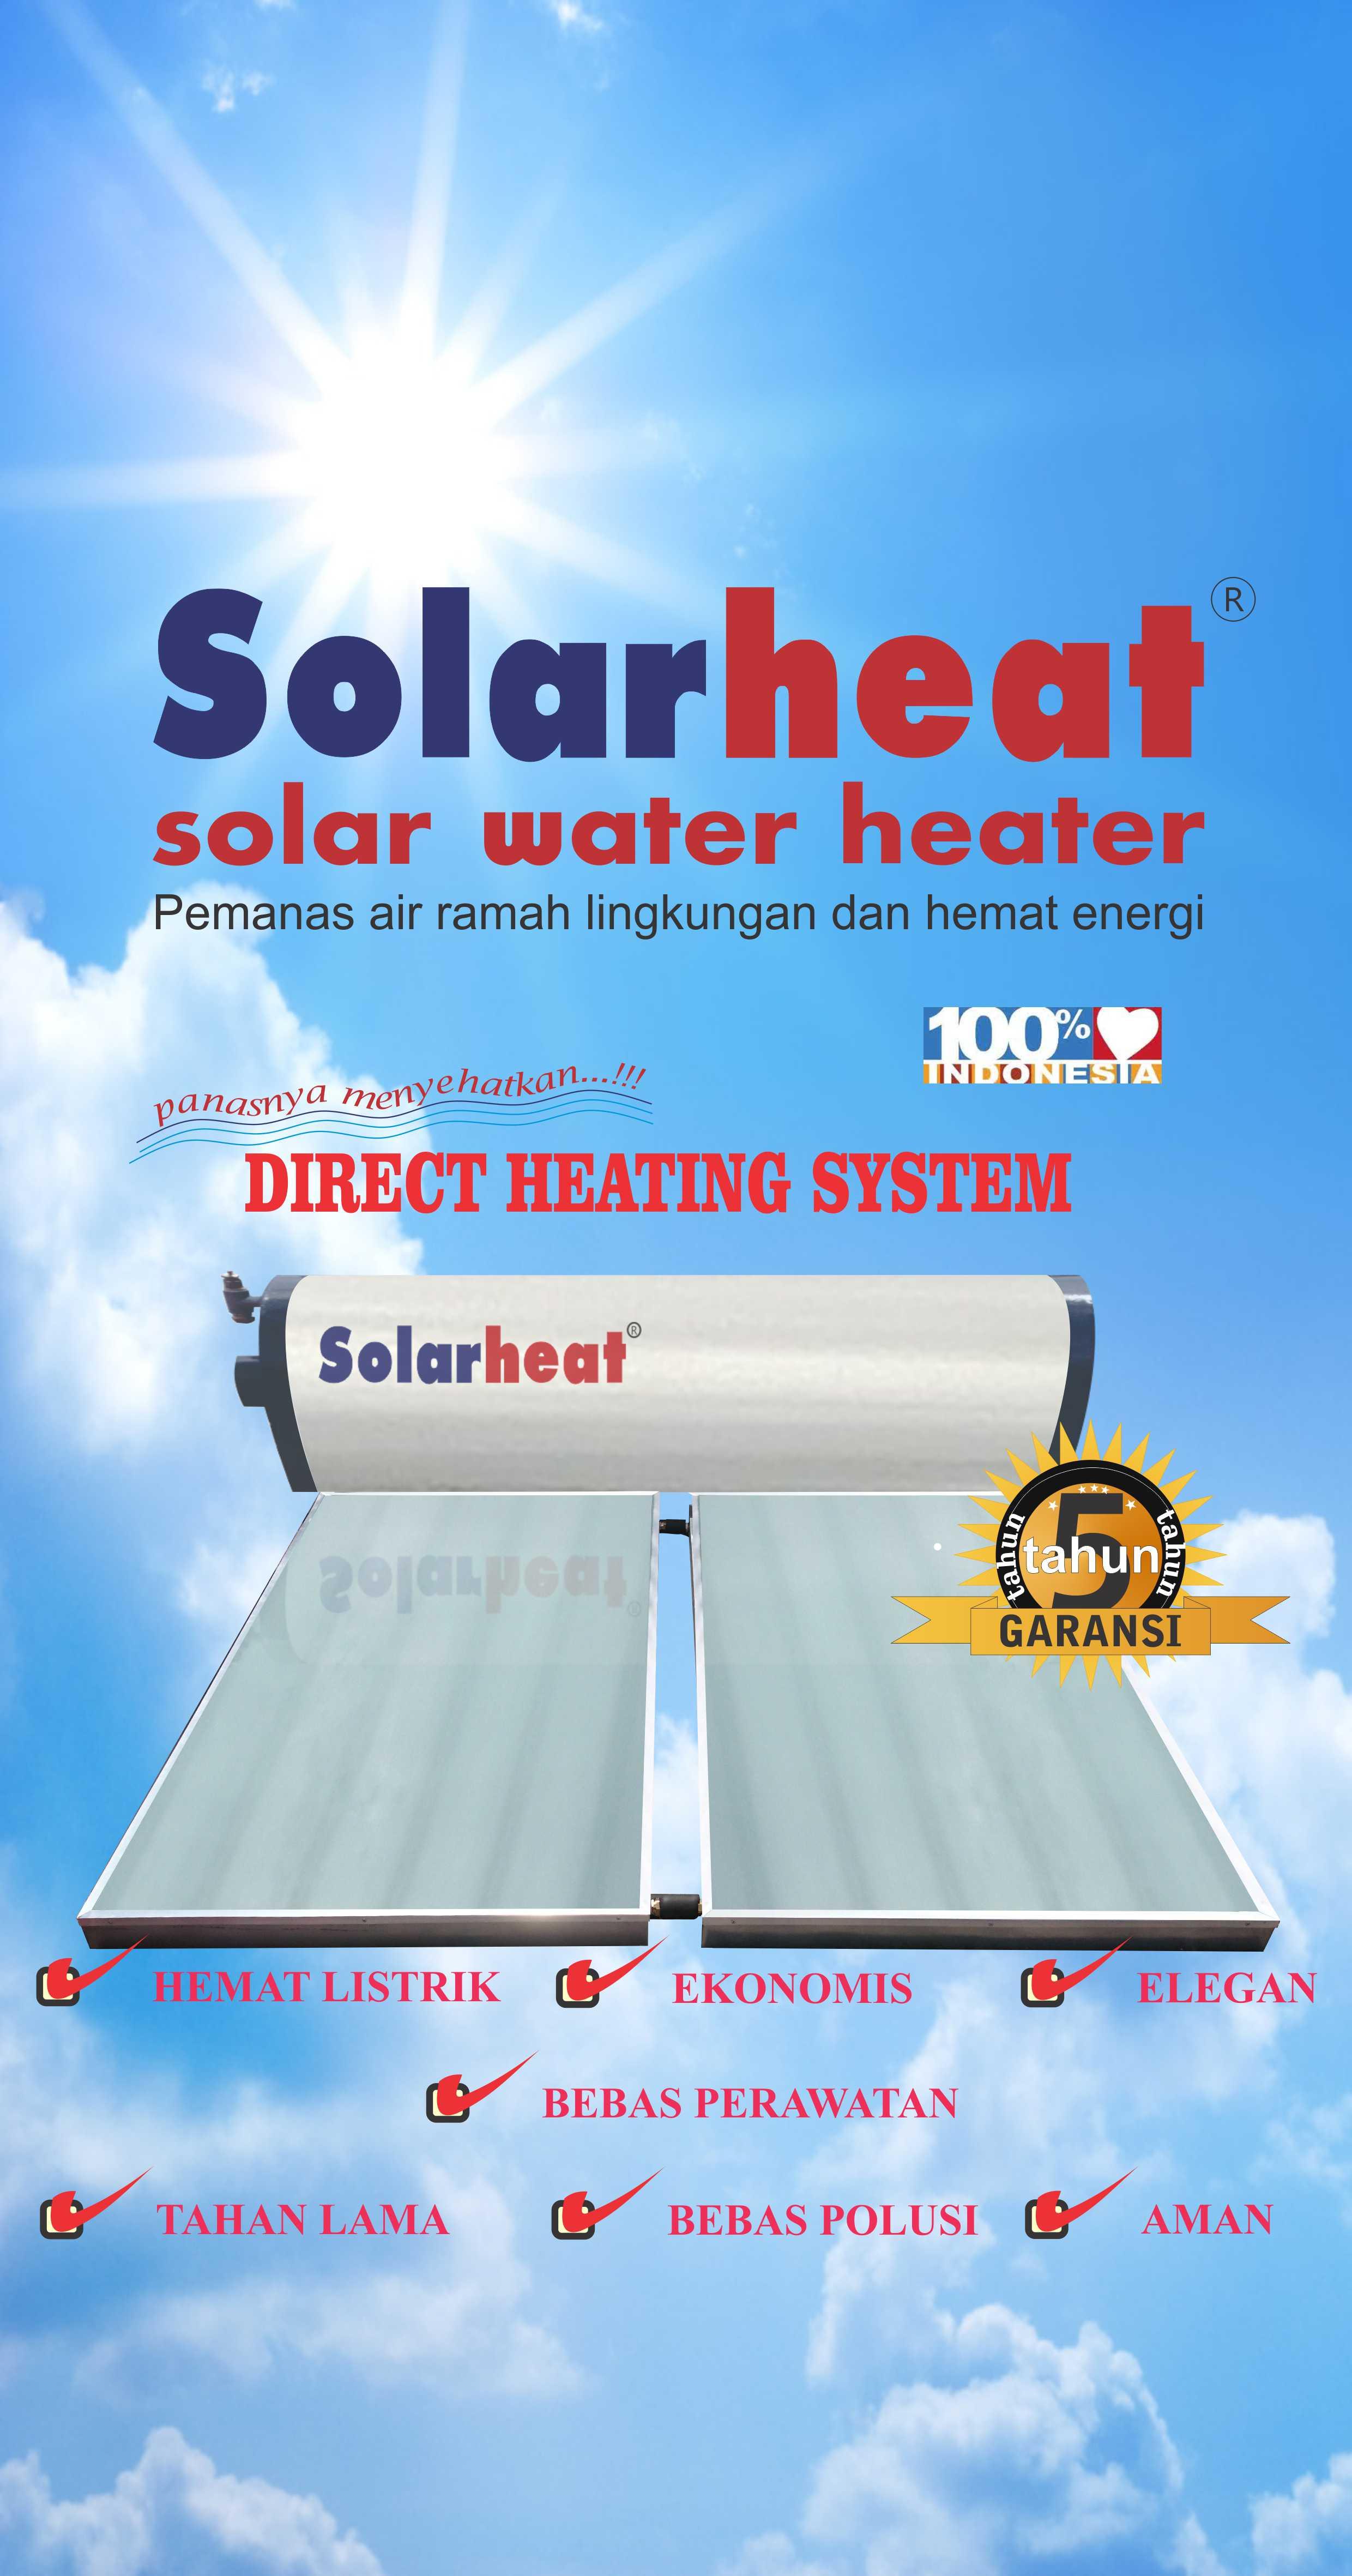 Welcome To Solarheat Solarheat Solar Water Heater